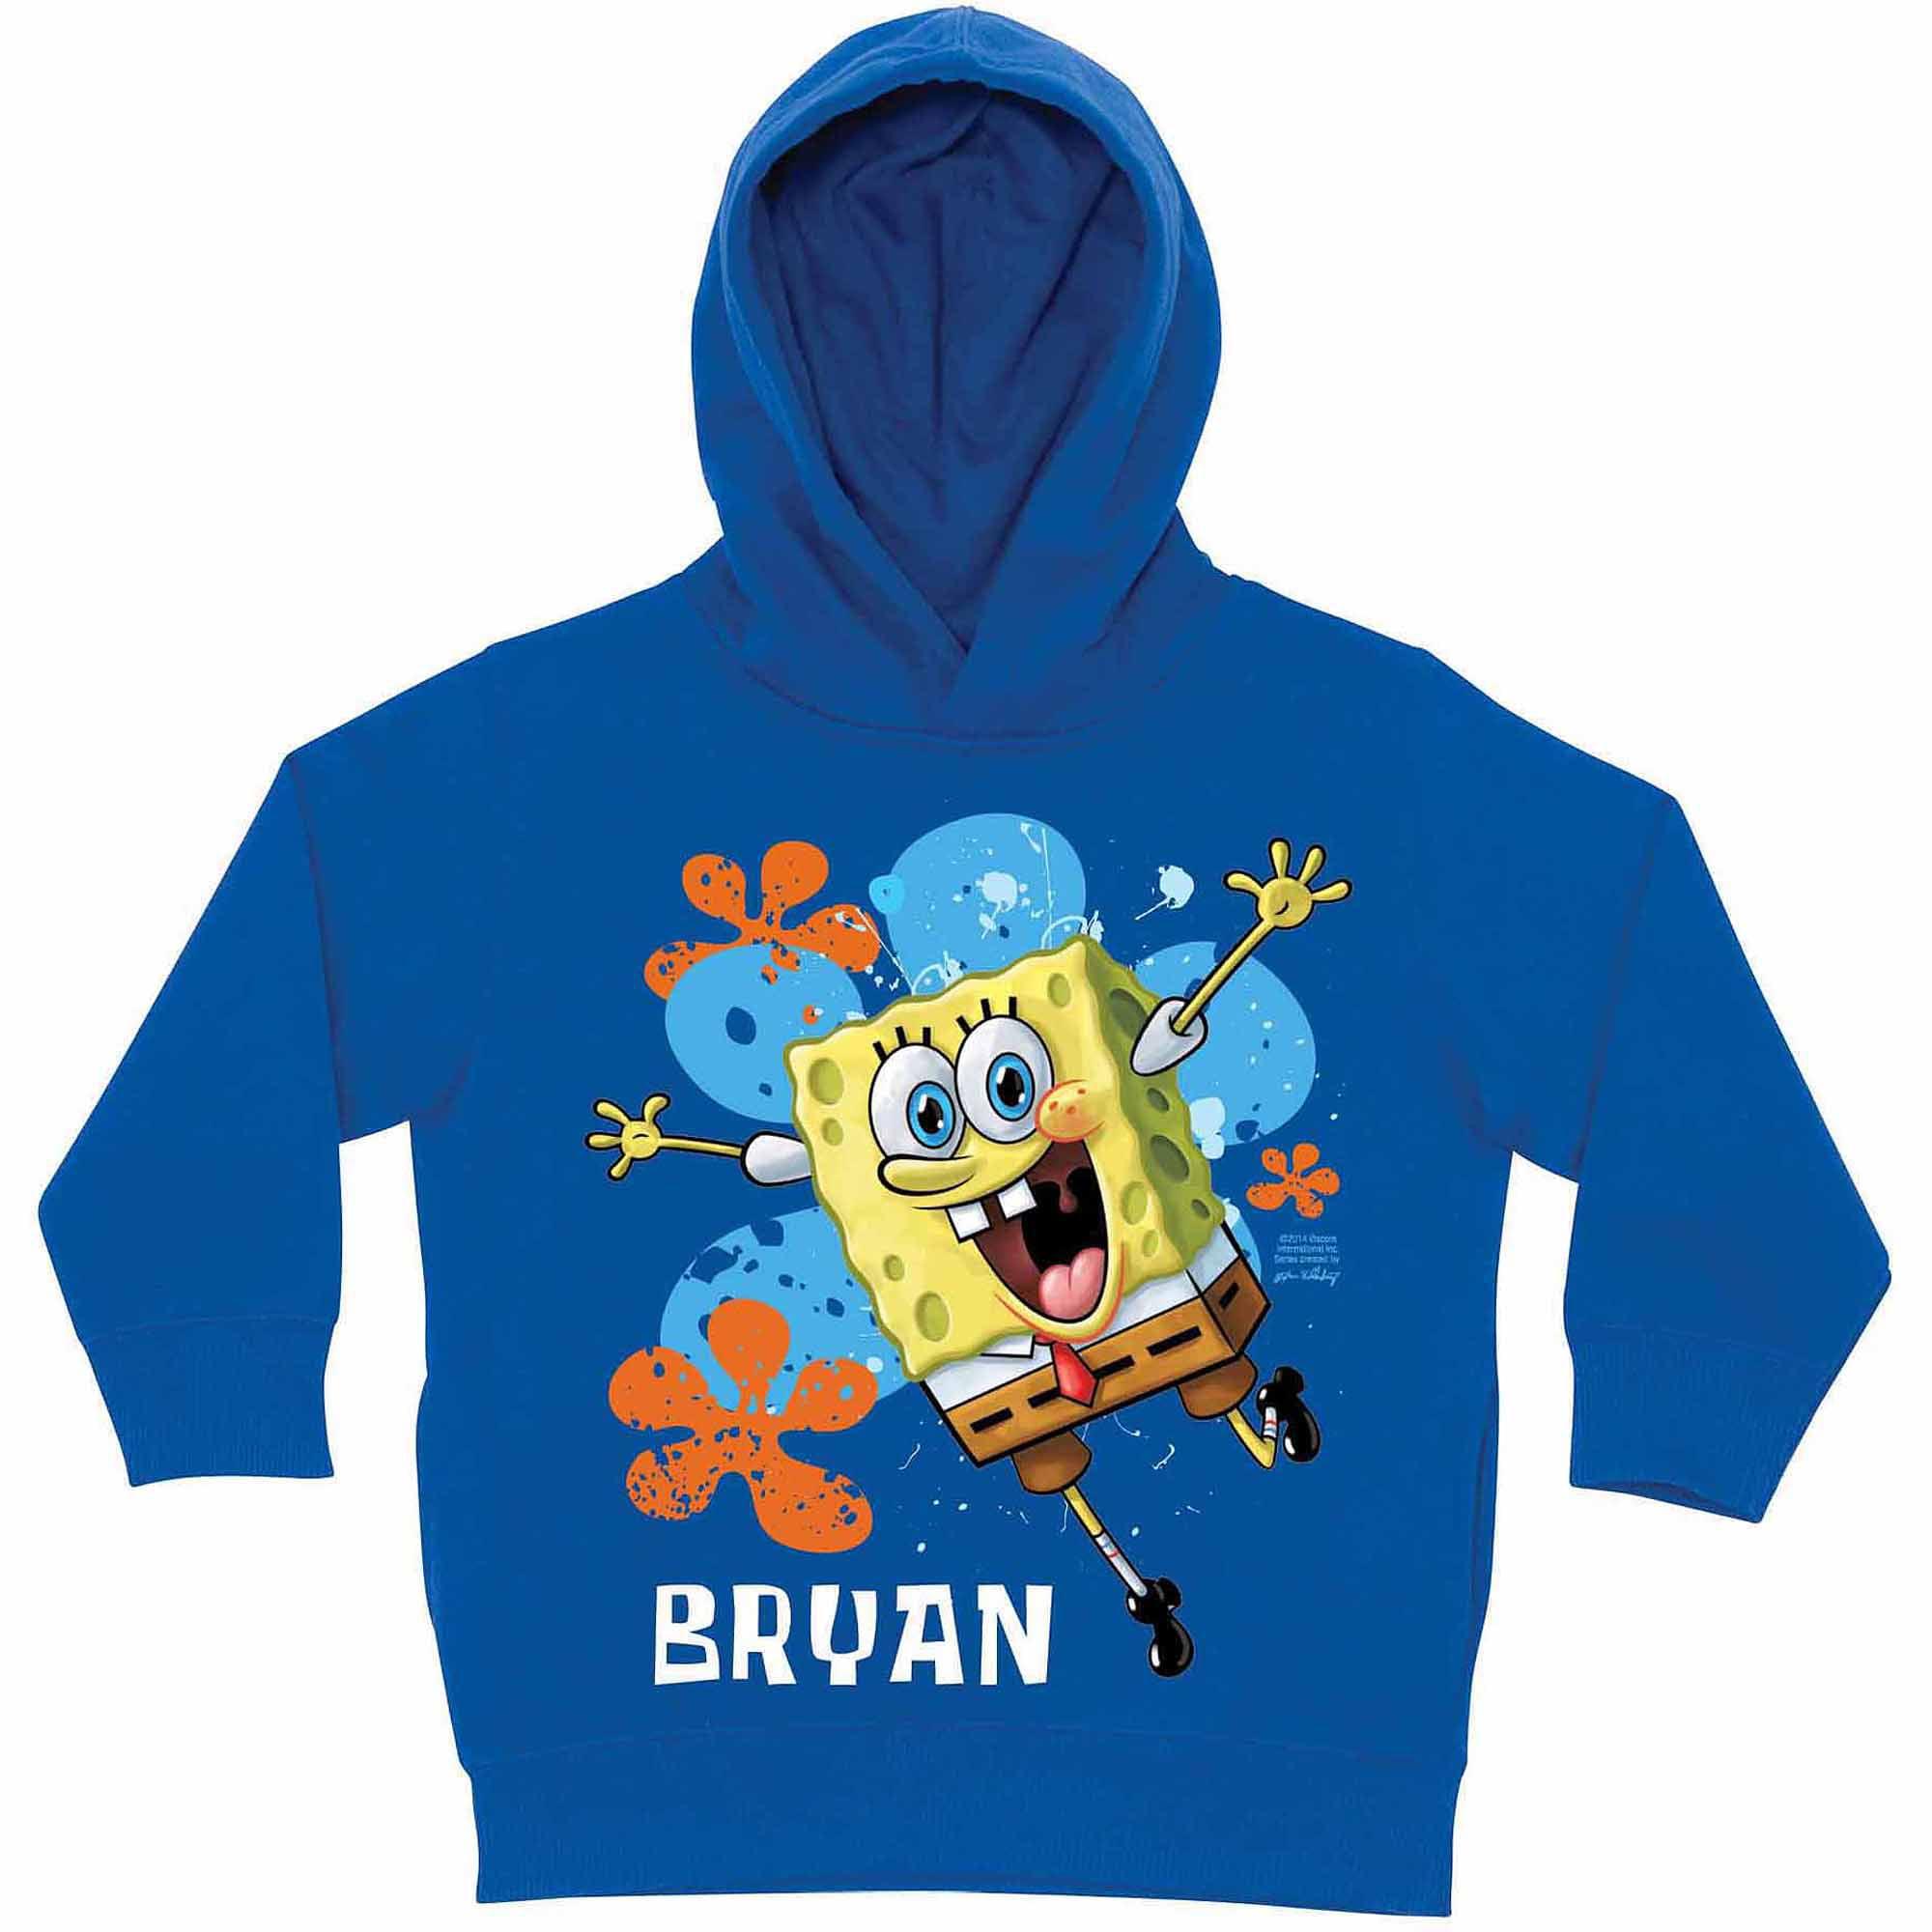 Personalized SpongeBob SquarePants Jump Little Boys' Royal Blue Hoodie